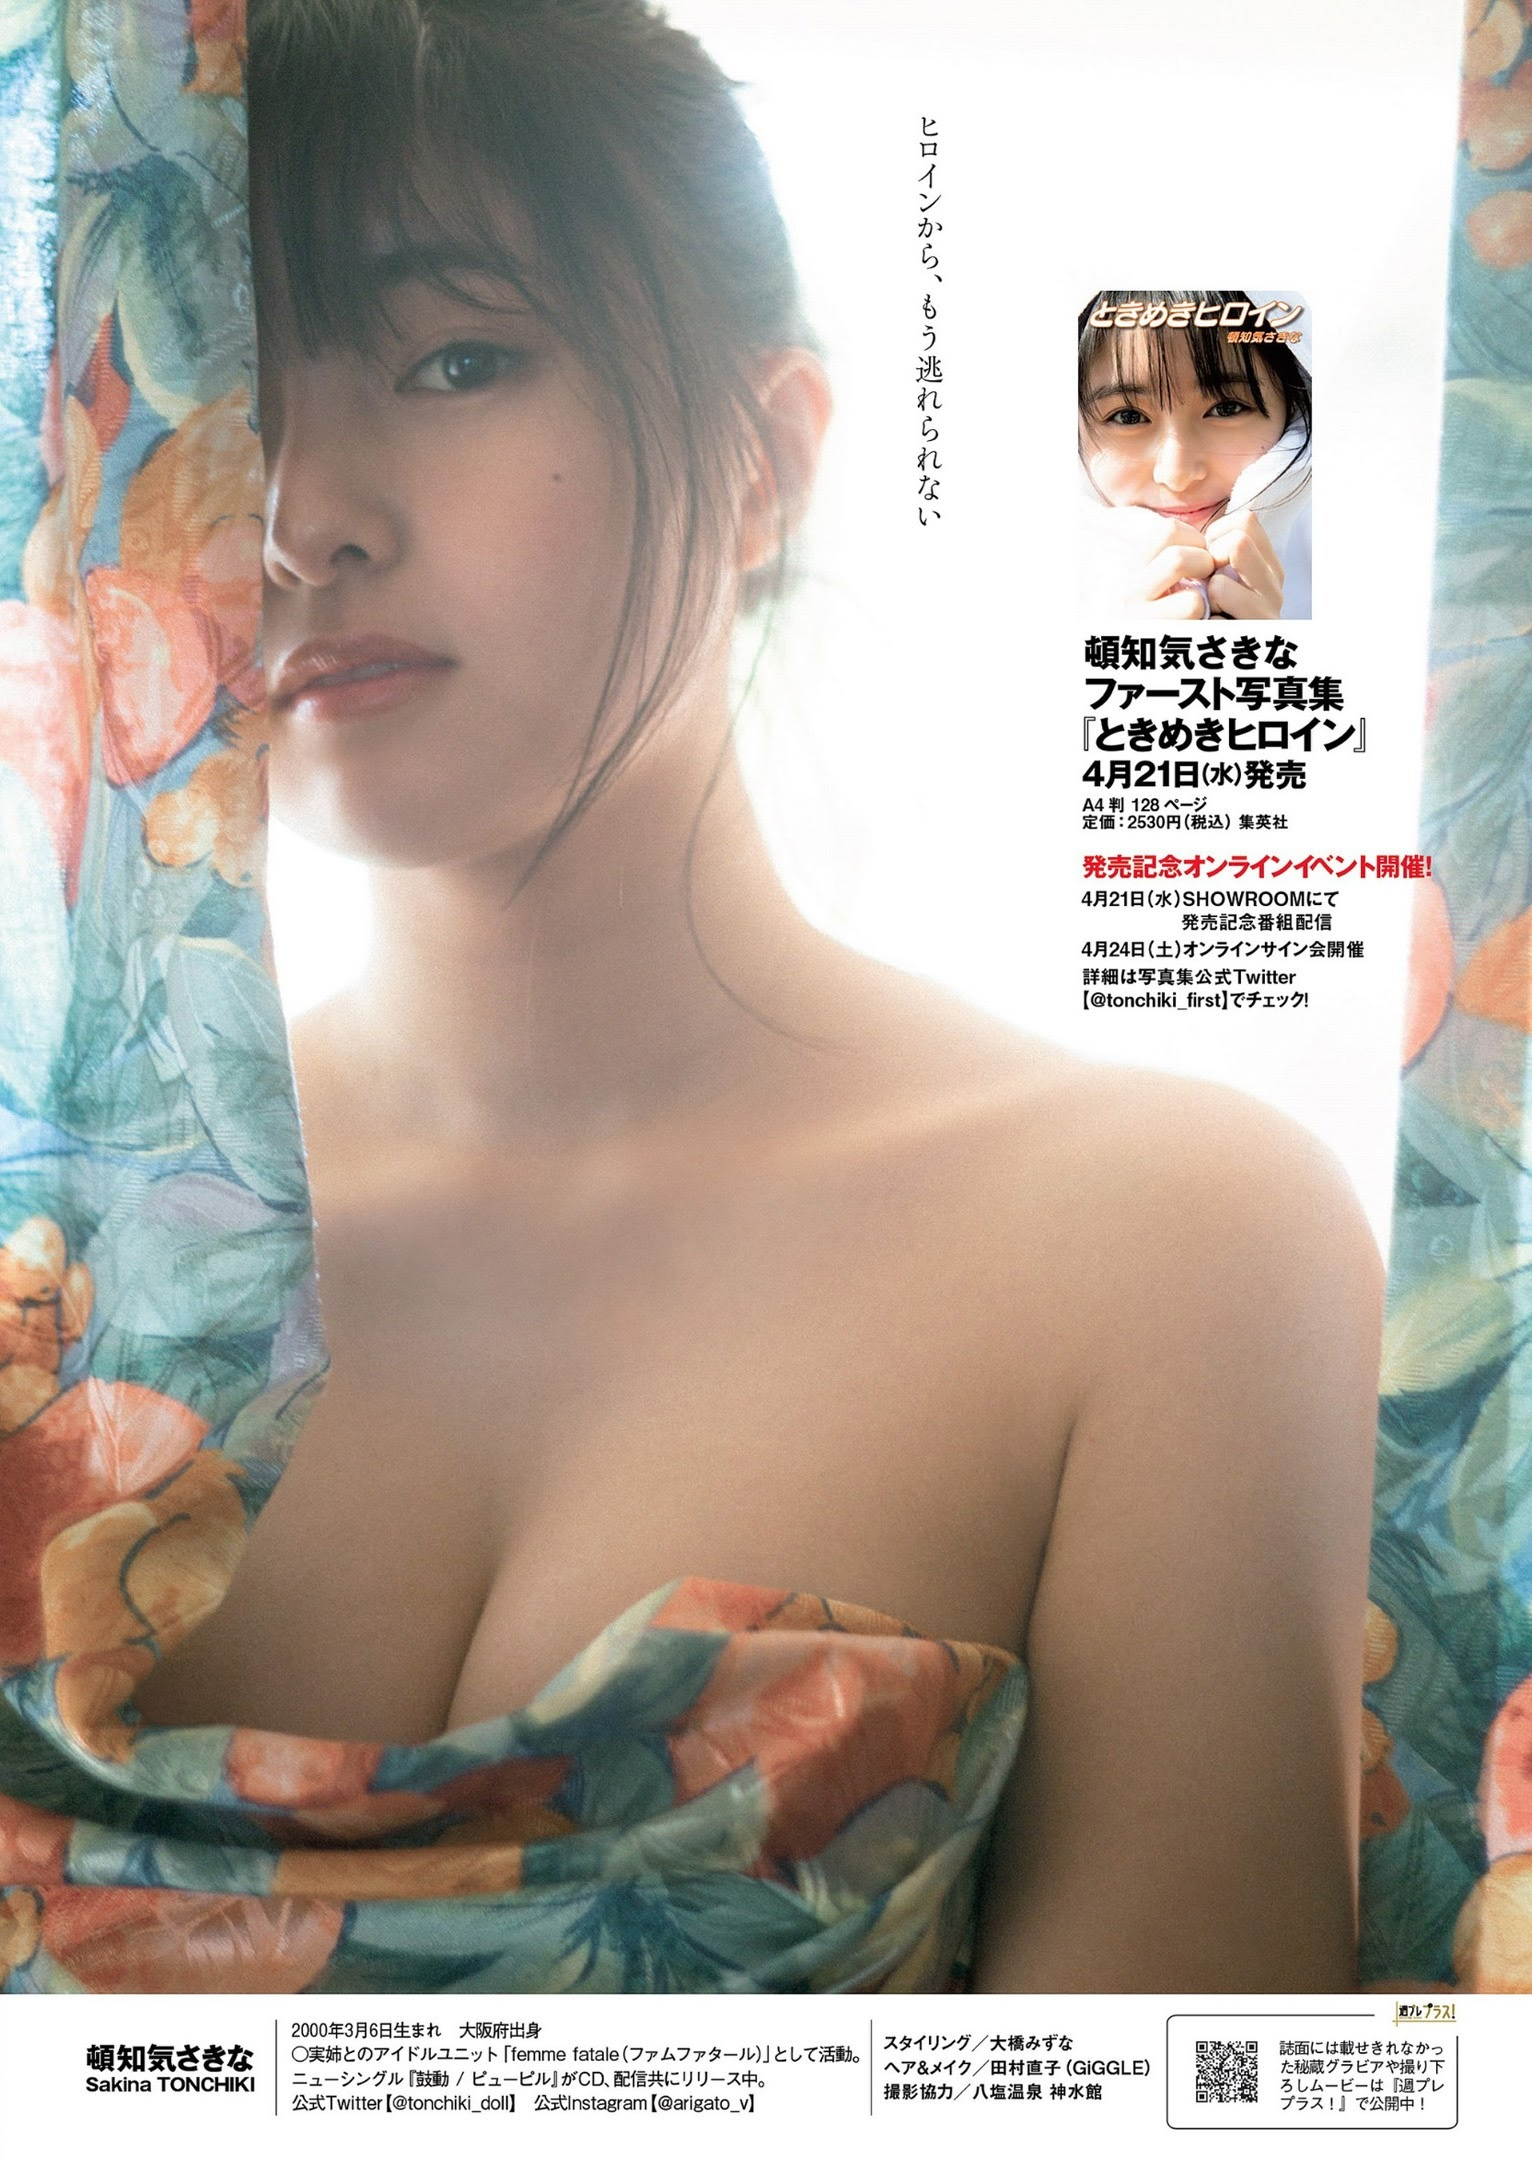 小山璃奈 頓知気さきな 伊藤美来-Weekly Playboy 2021年第十八期 高清套图 第26张